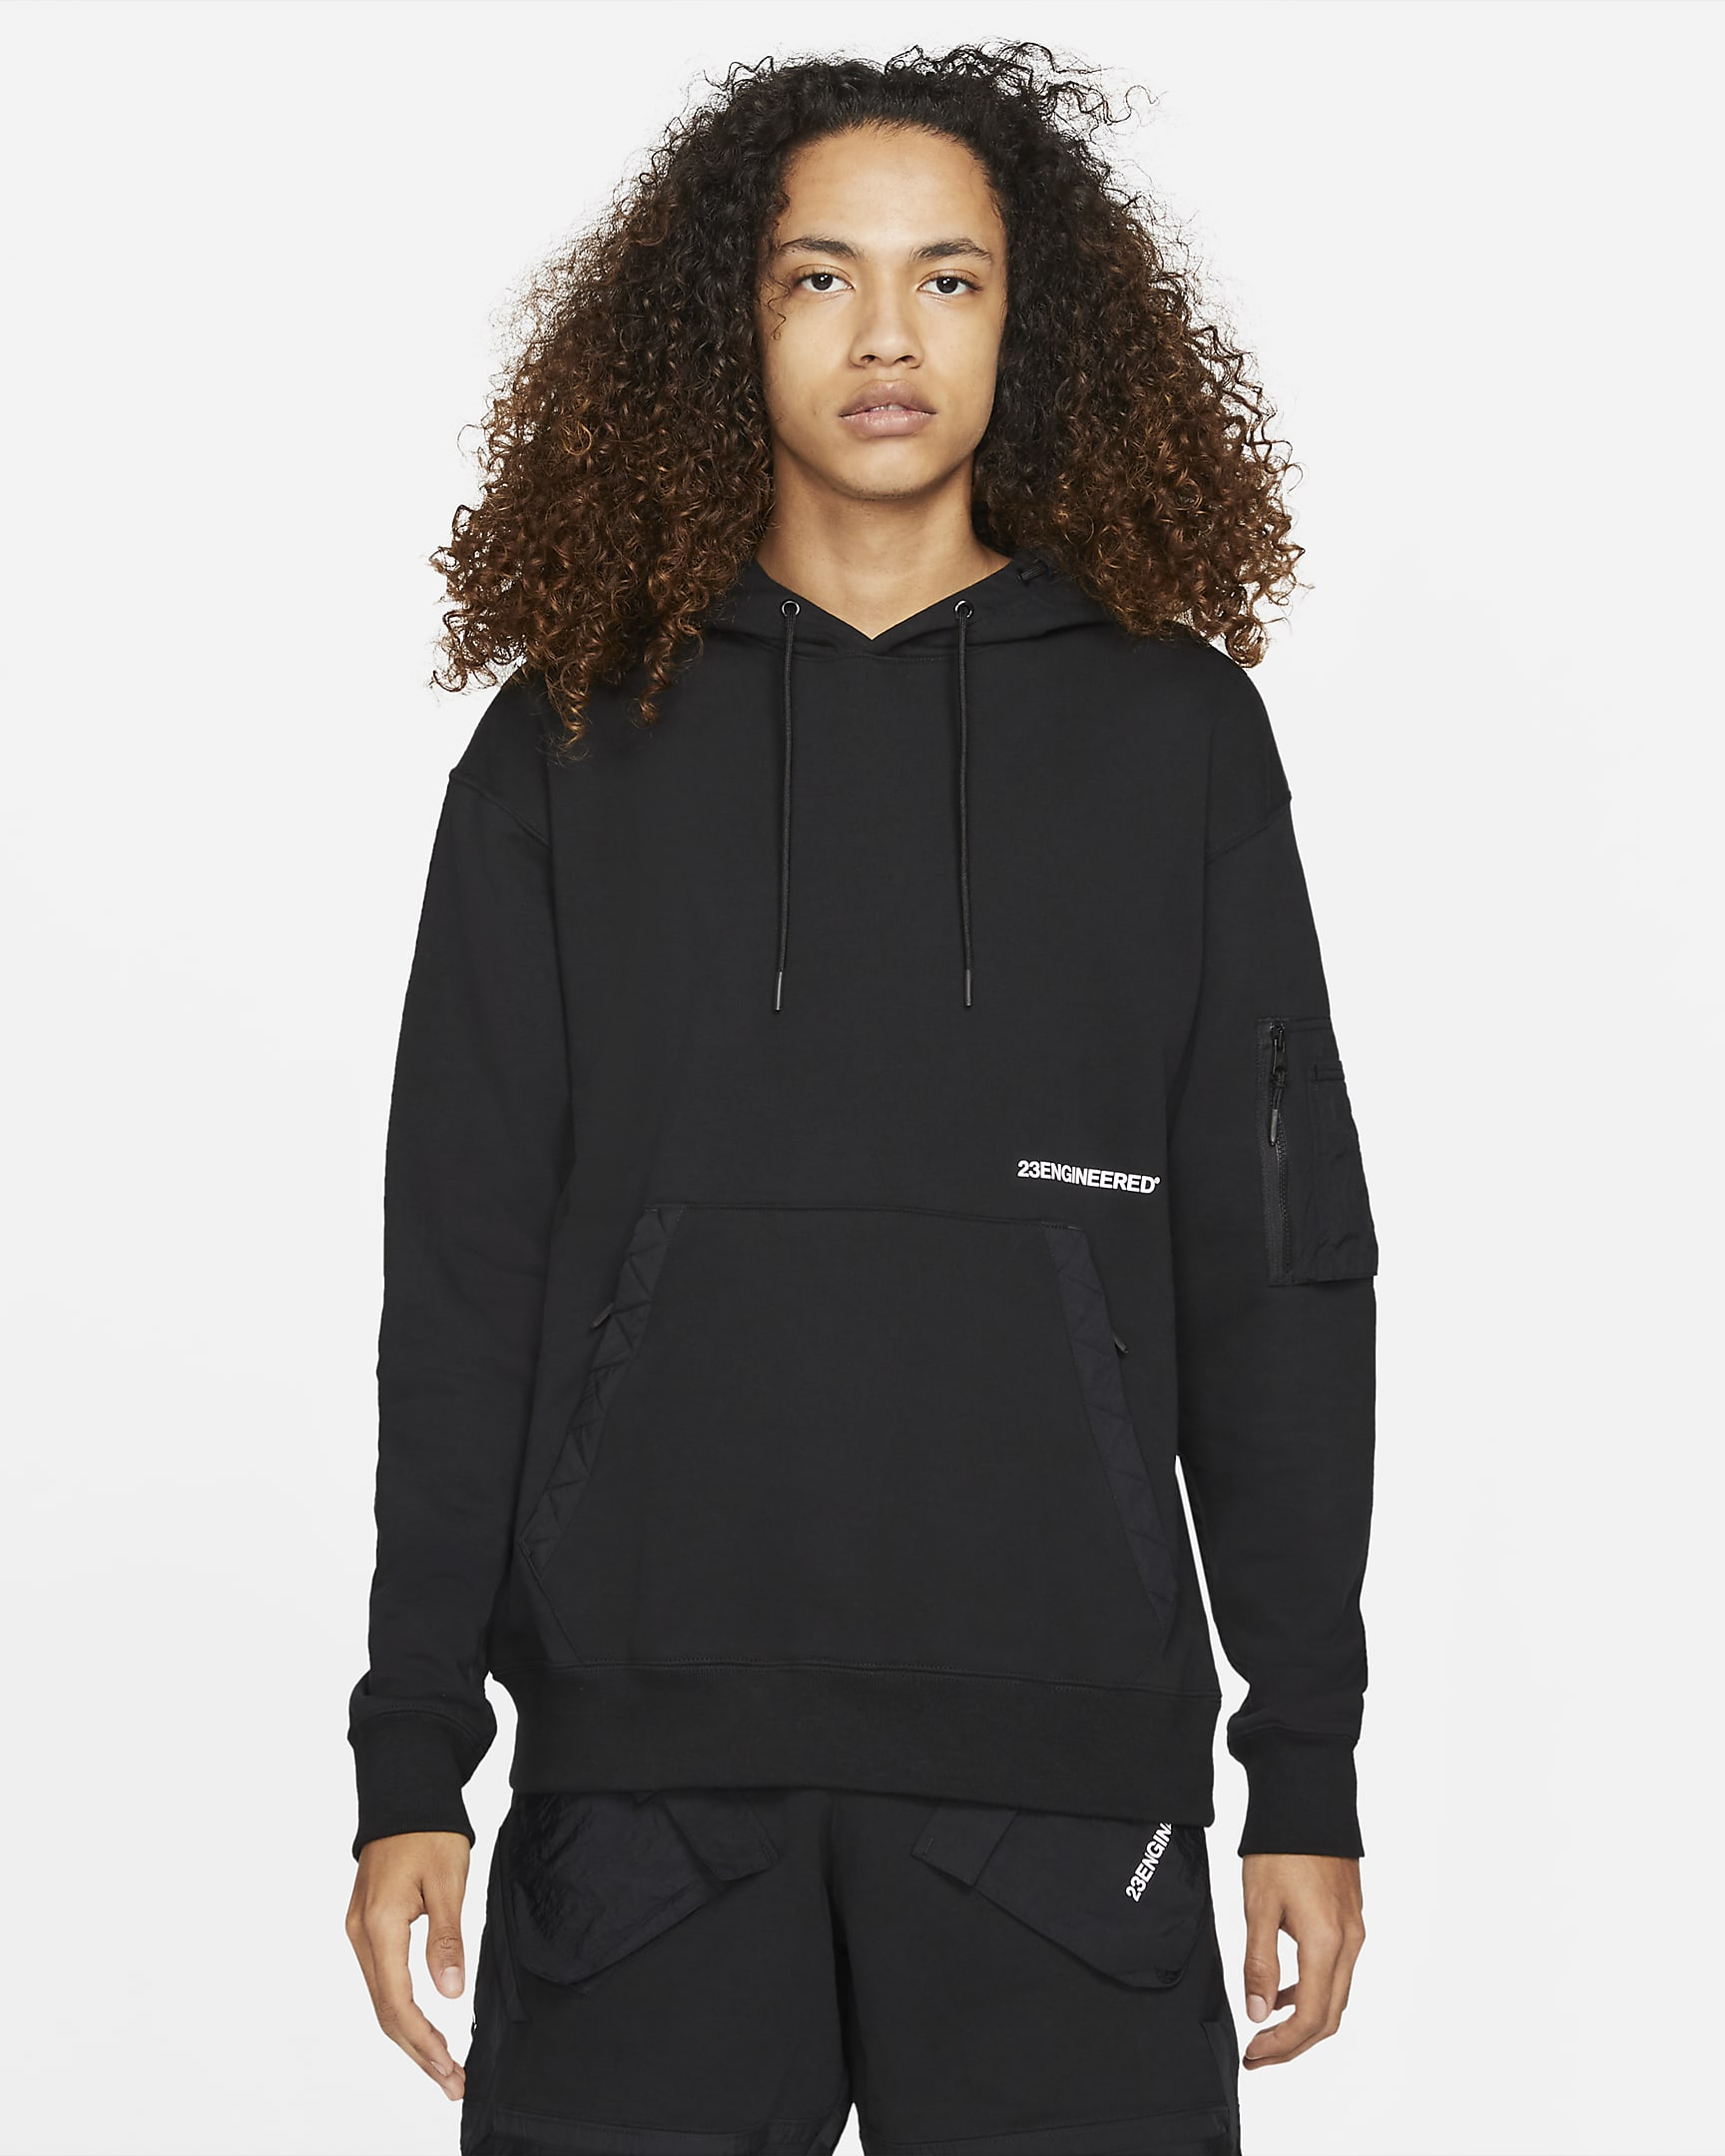 jordan-23-engineered-mens-fleece-pullover-hoodie-QbRhJ5.png